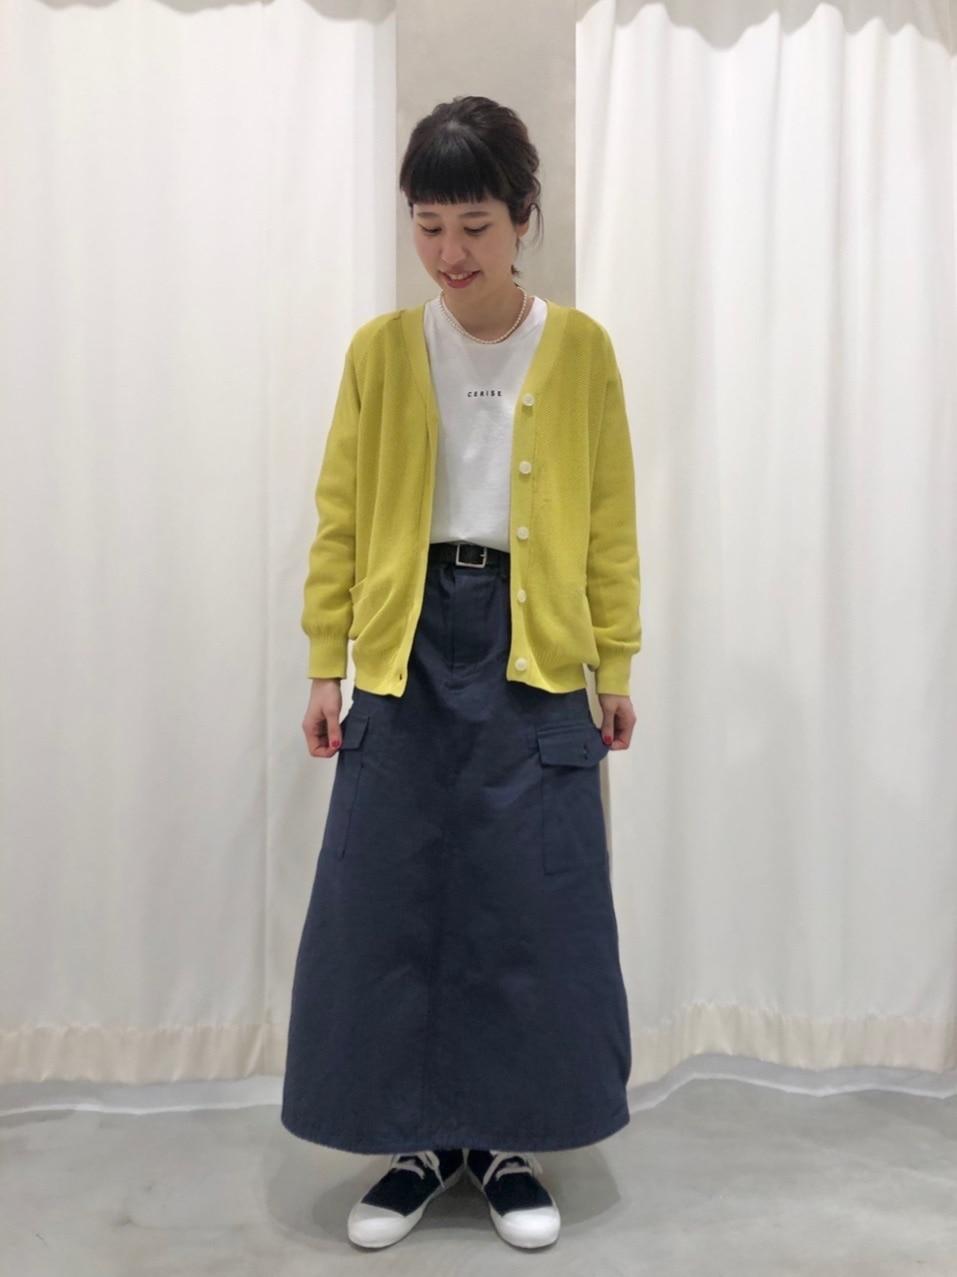 CHILD WOMAN , PAR ICI 東京スカイツリータウン・ソラマチ 2021.03.22